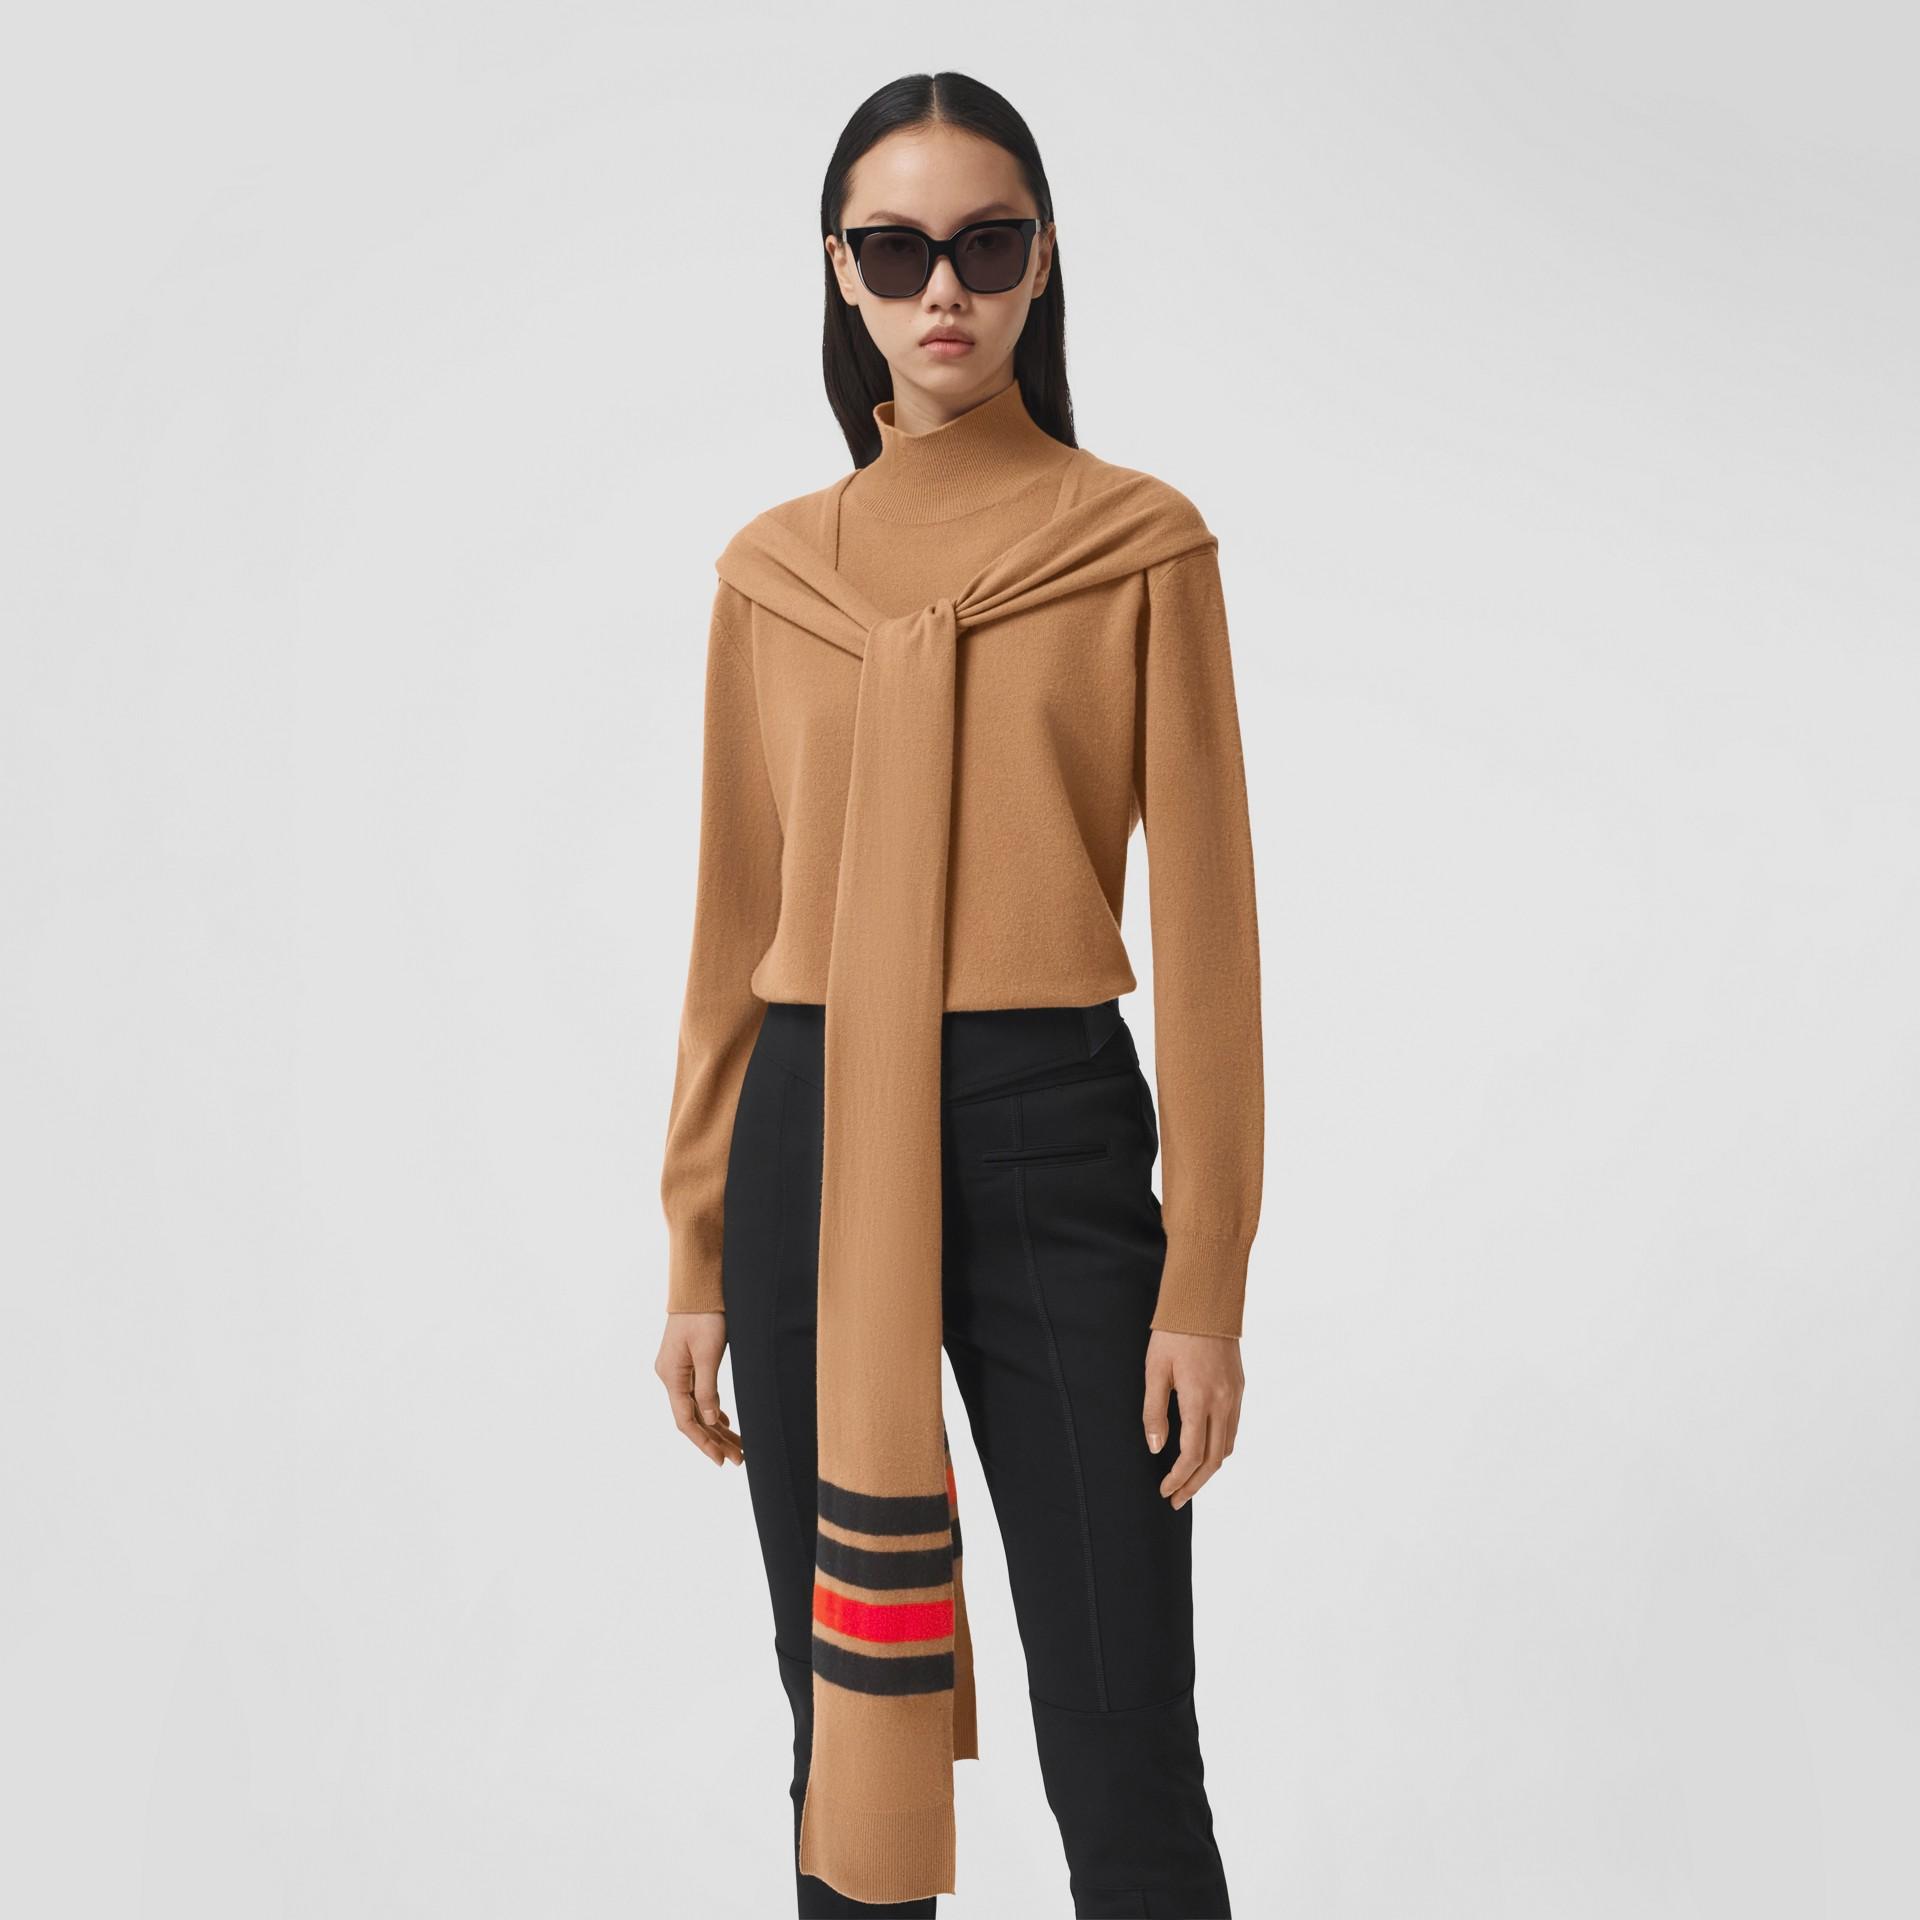 Striped Scarf Detail Merino Wool Cashmere Sweater in Beige - Women | Burberry - gallery image 4